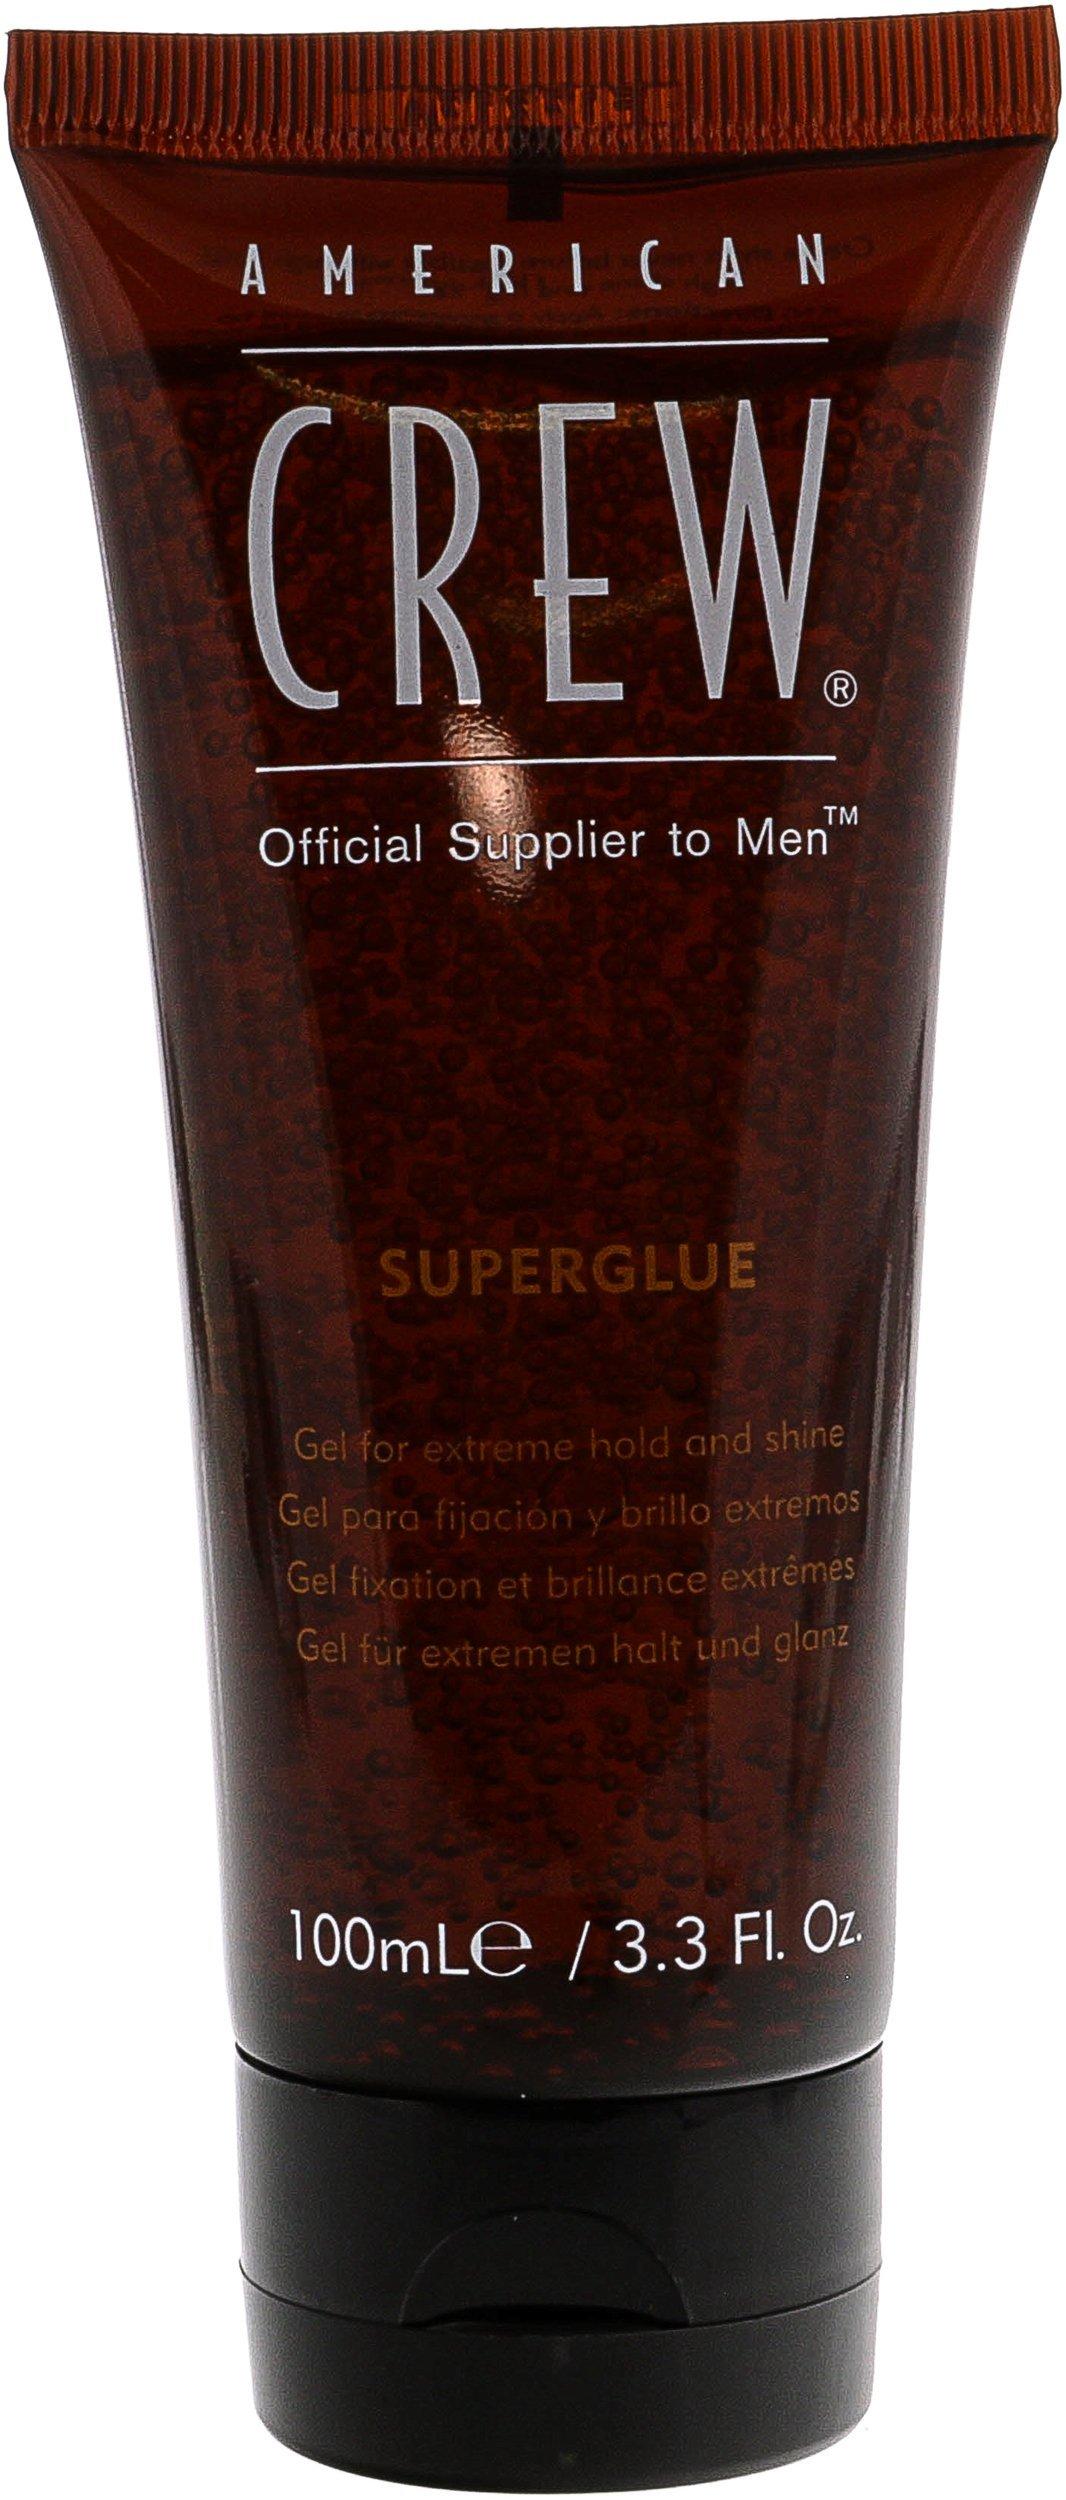 American Crew Classic Superglue 3.30 oz (Pack of 7)